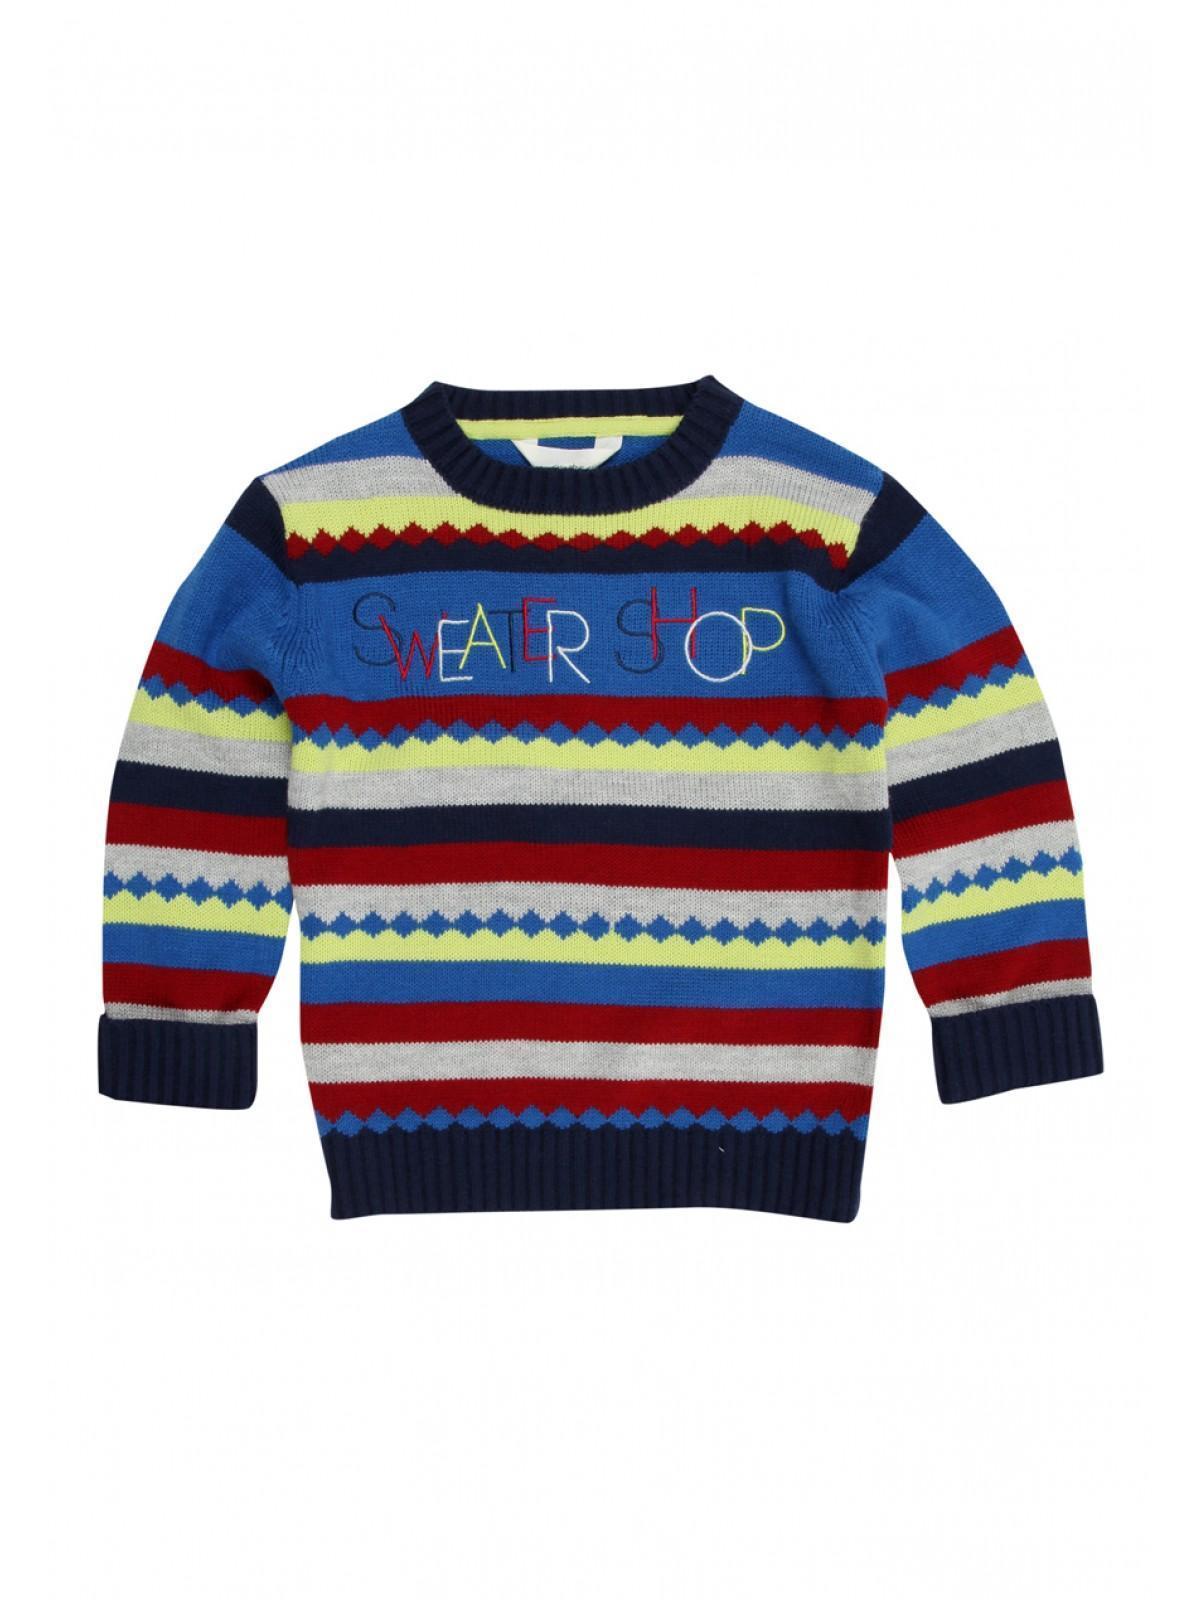 Boys Sweater Shop Boys Logo Jumper | Peacocks